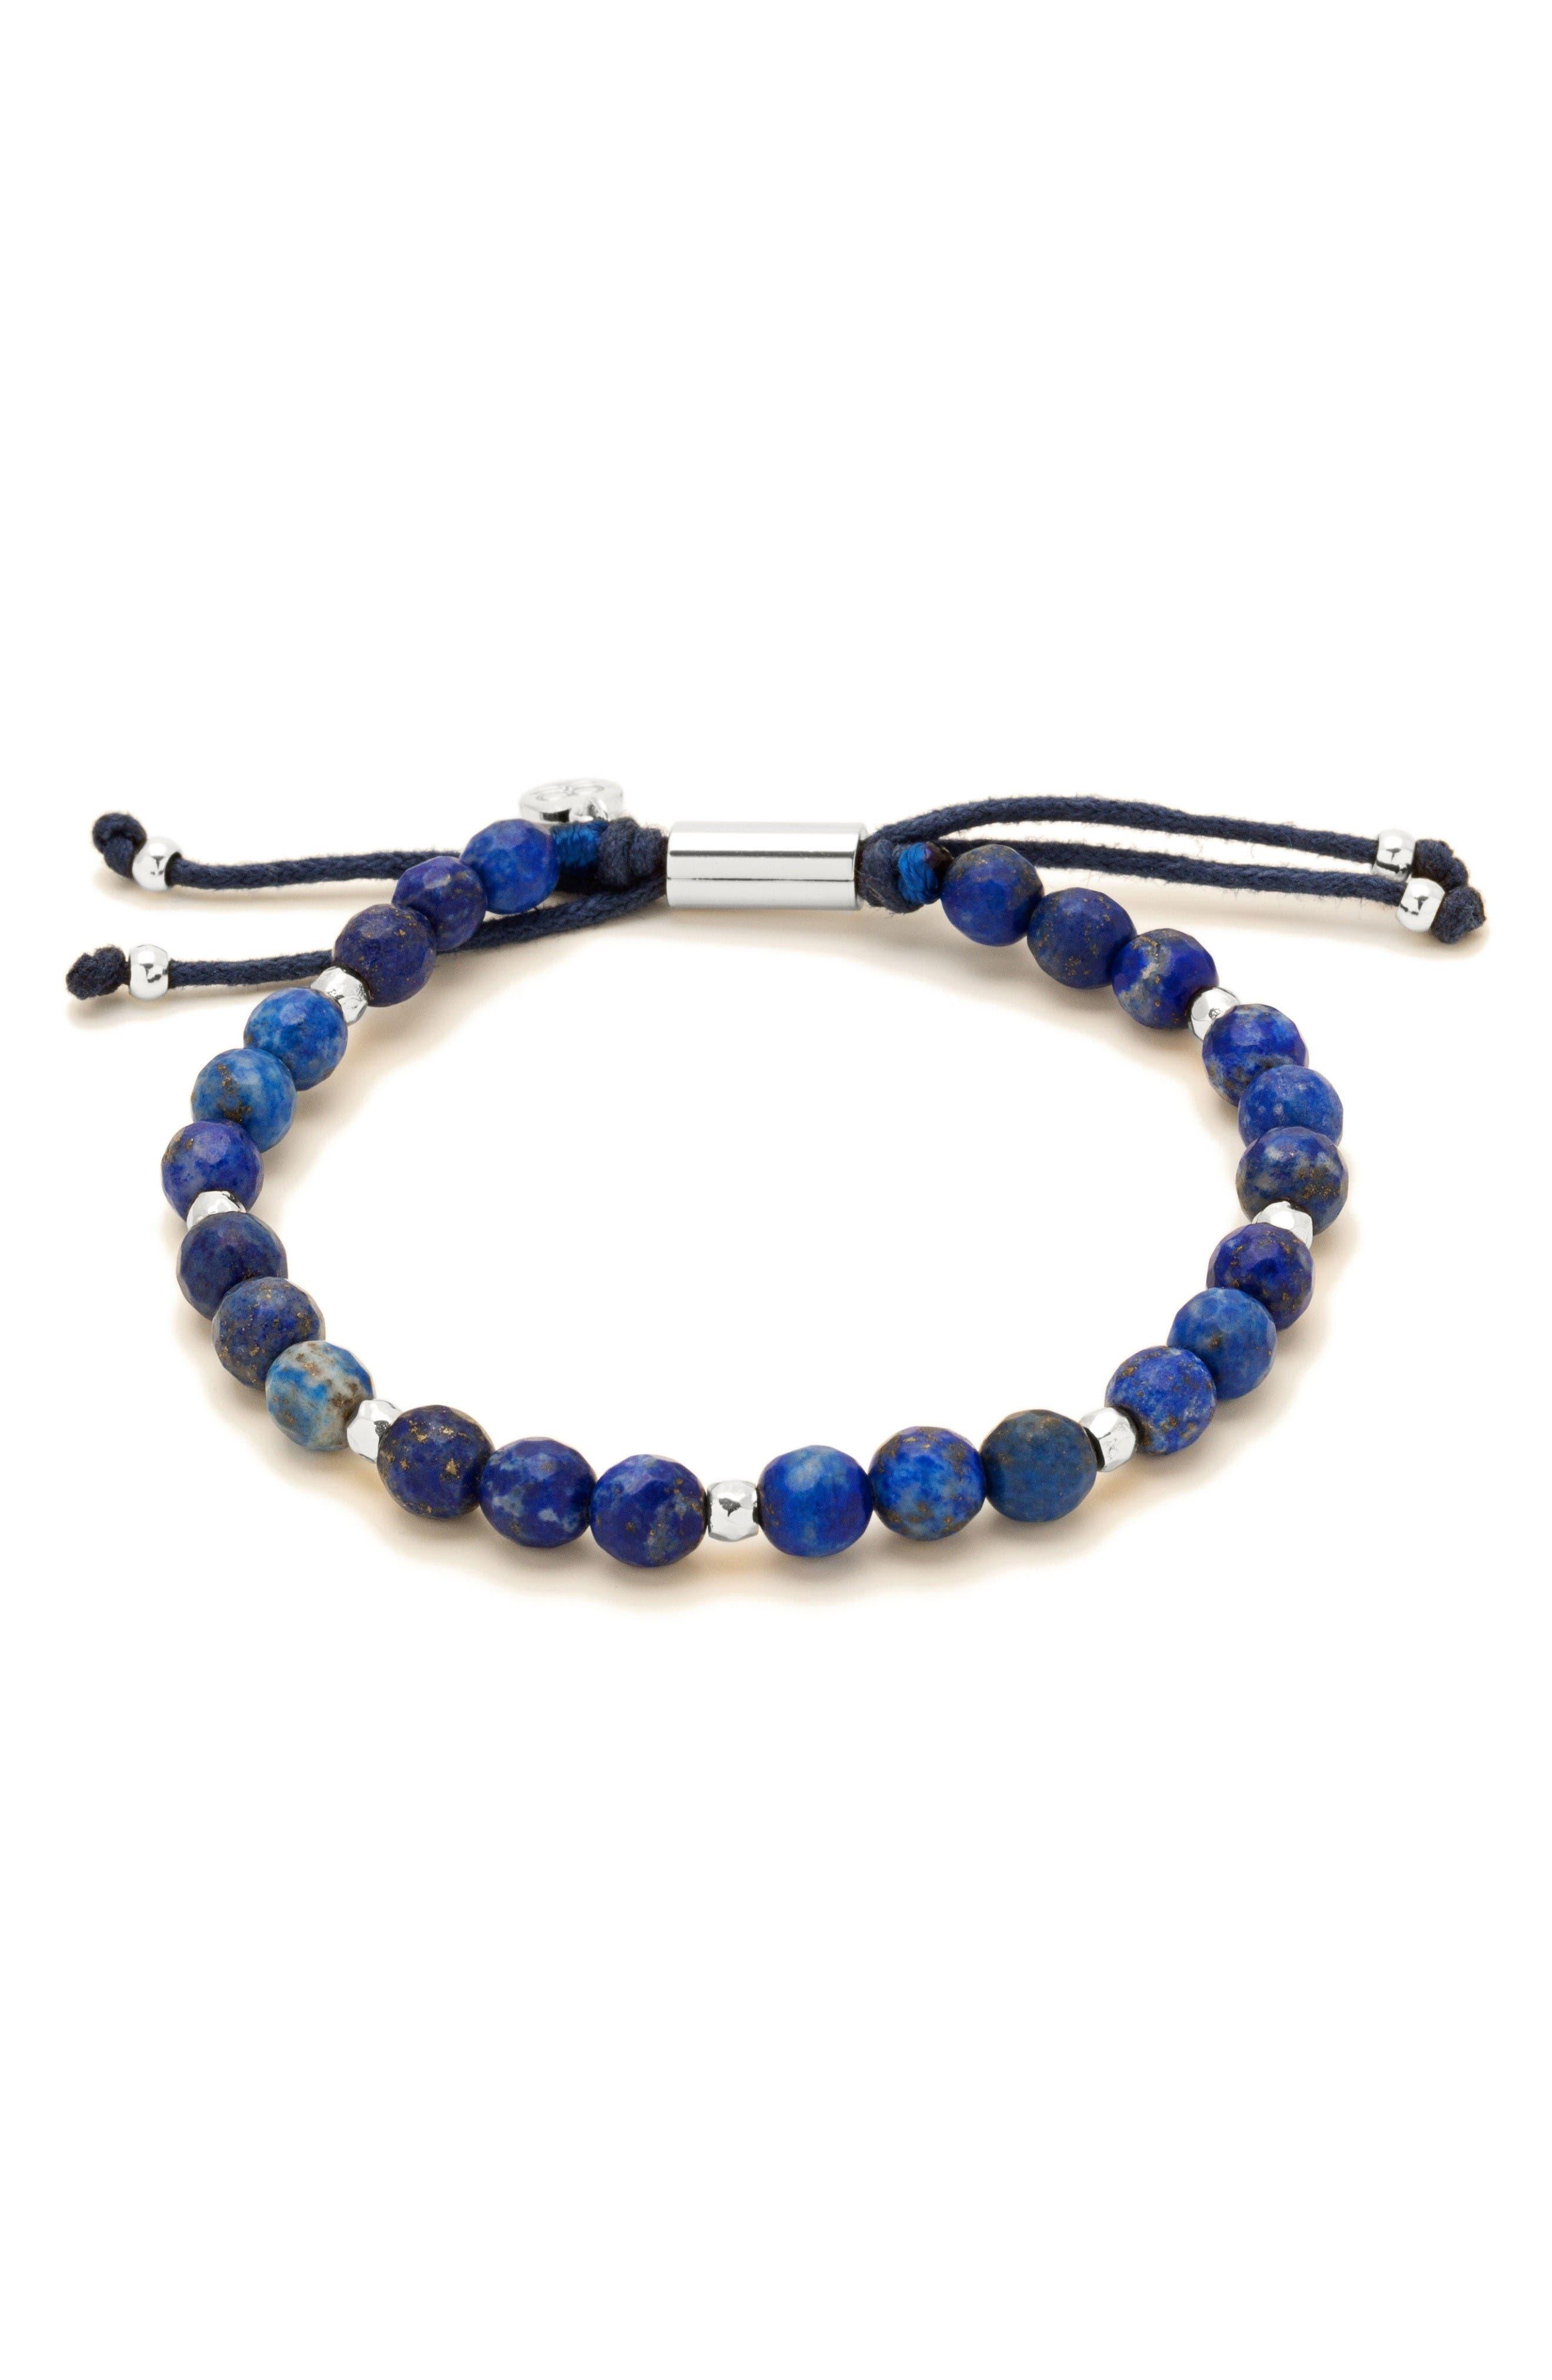 Main Image - gorjana Power Gemstone Beaded Bracelet